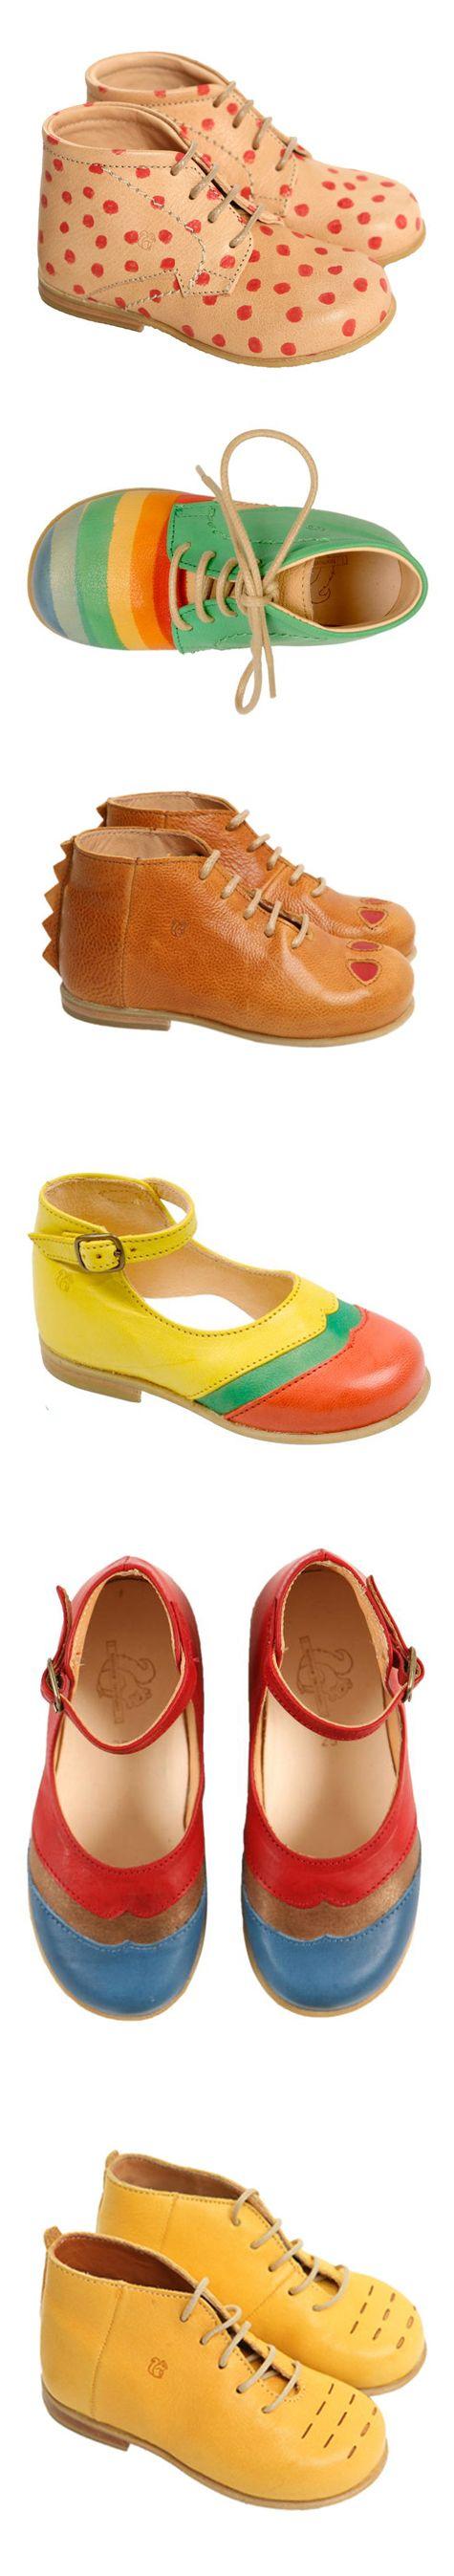 cute kids shoes!!